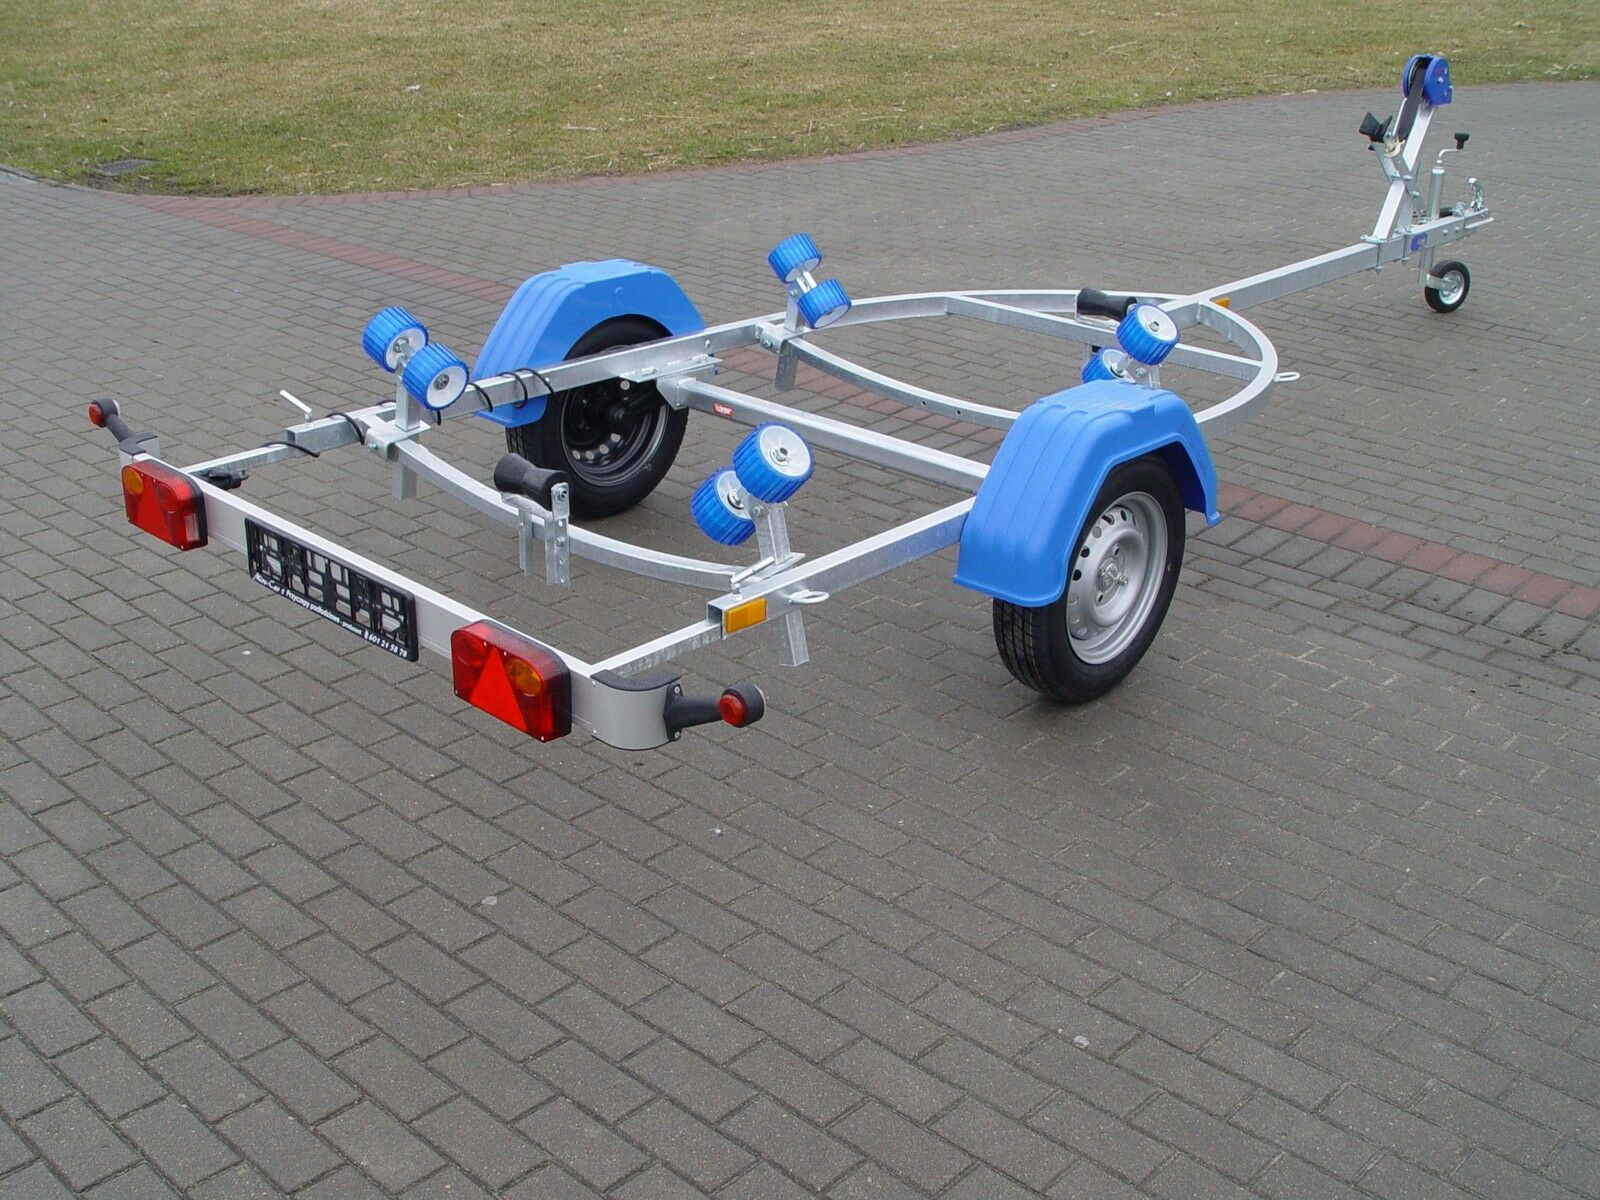 3 qm Boote v.2-7 m PROFI-Blinker Drift-Stop Drift-Sack 0,75 qm